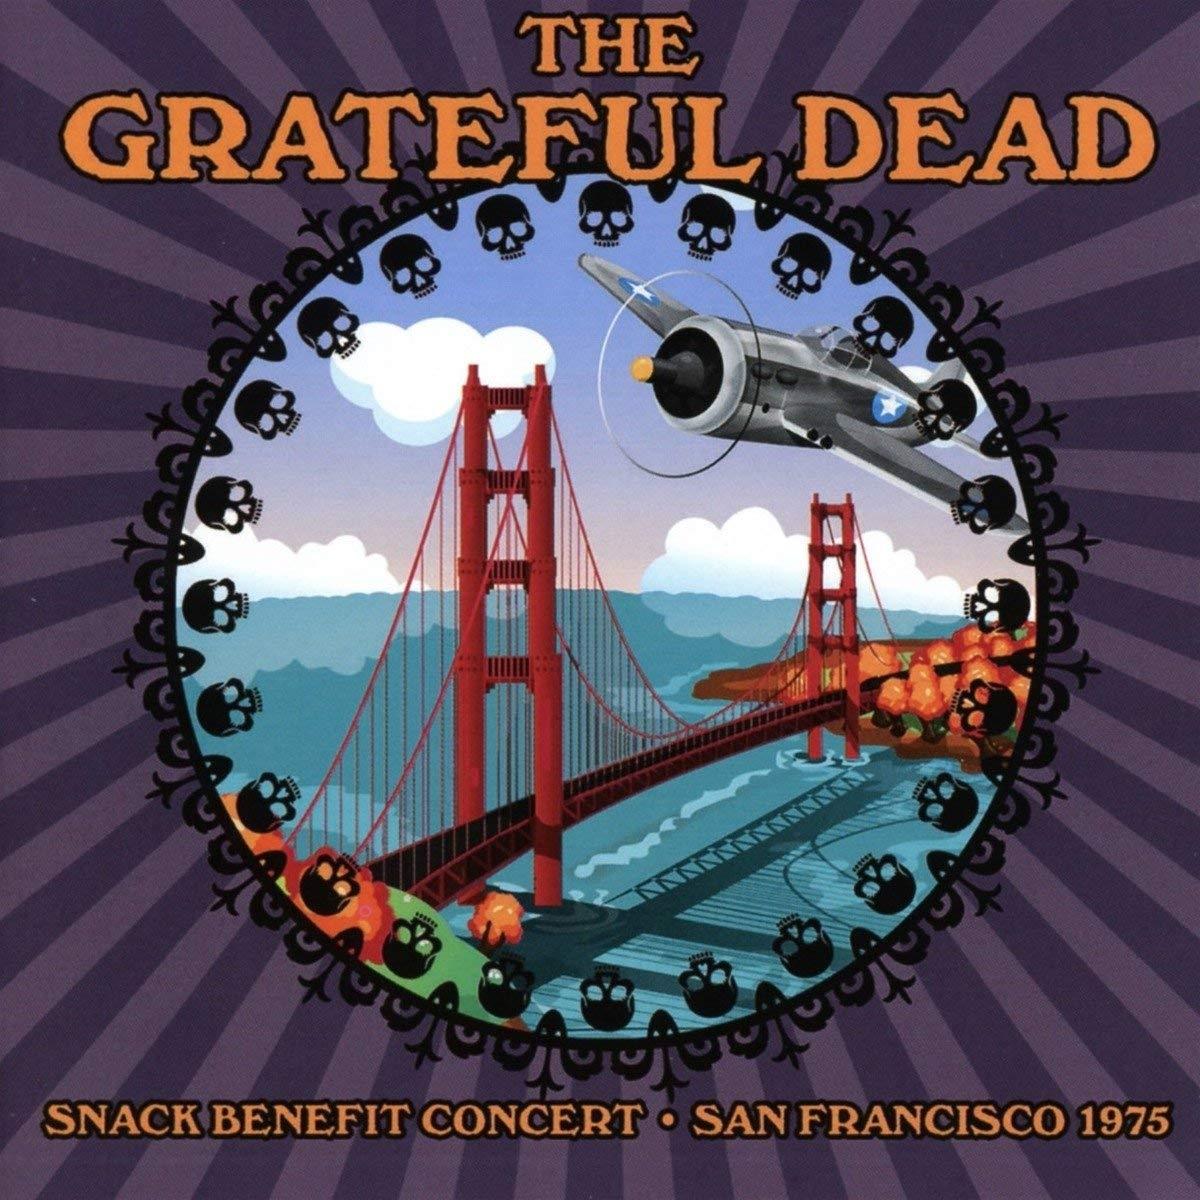 Snack Benefit Concert San Francisco 1975